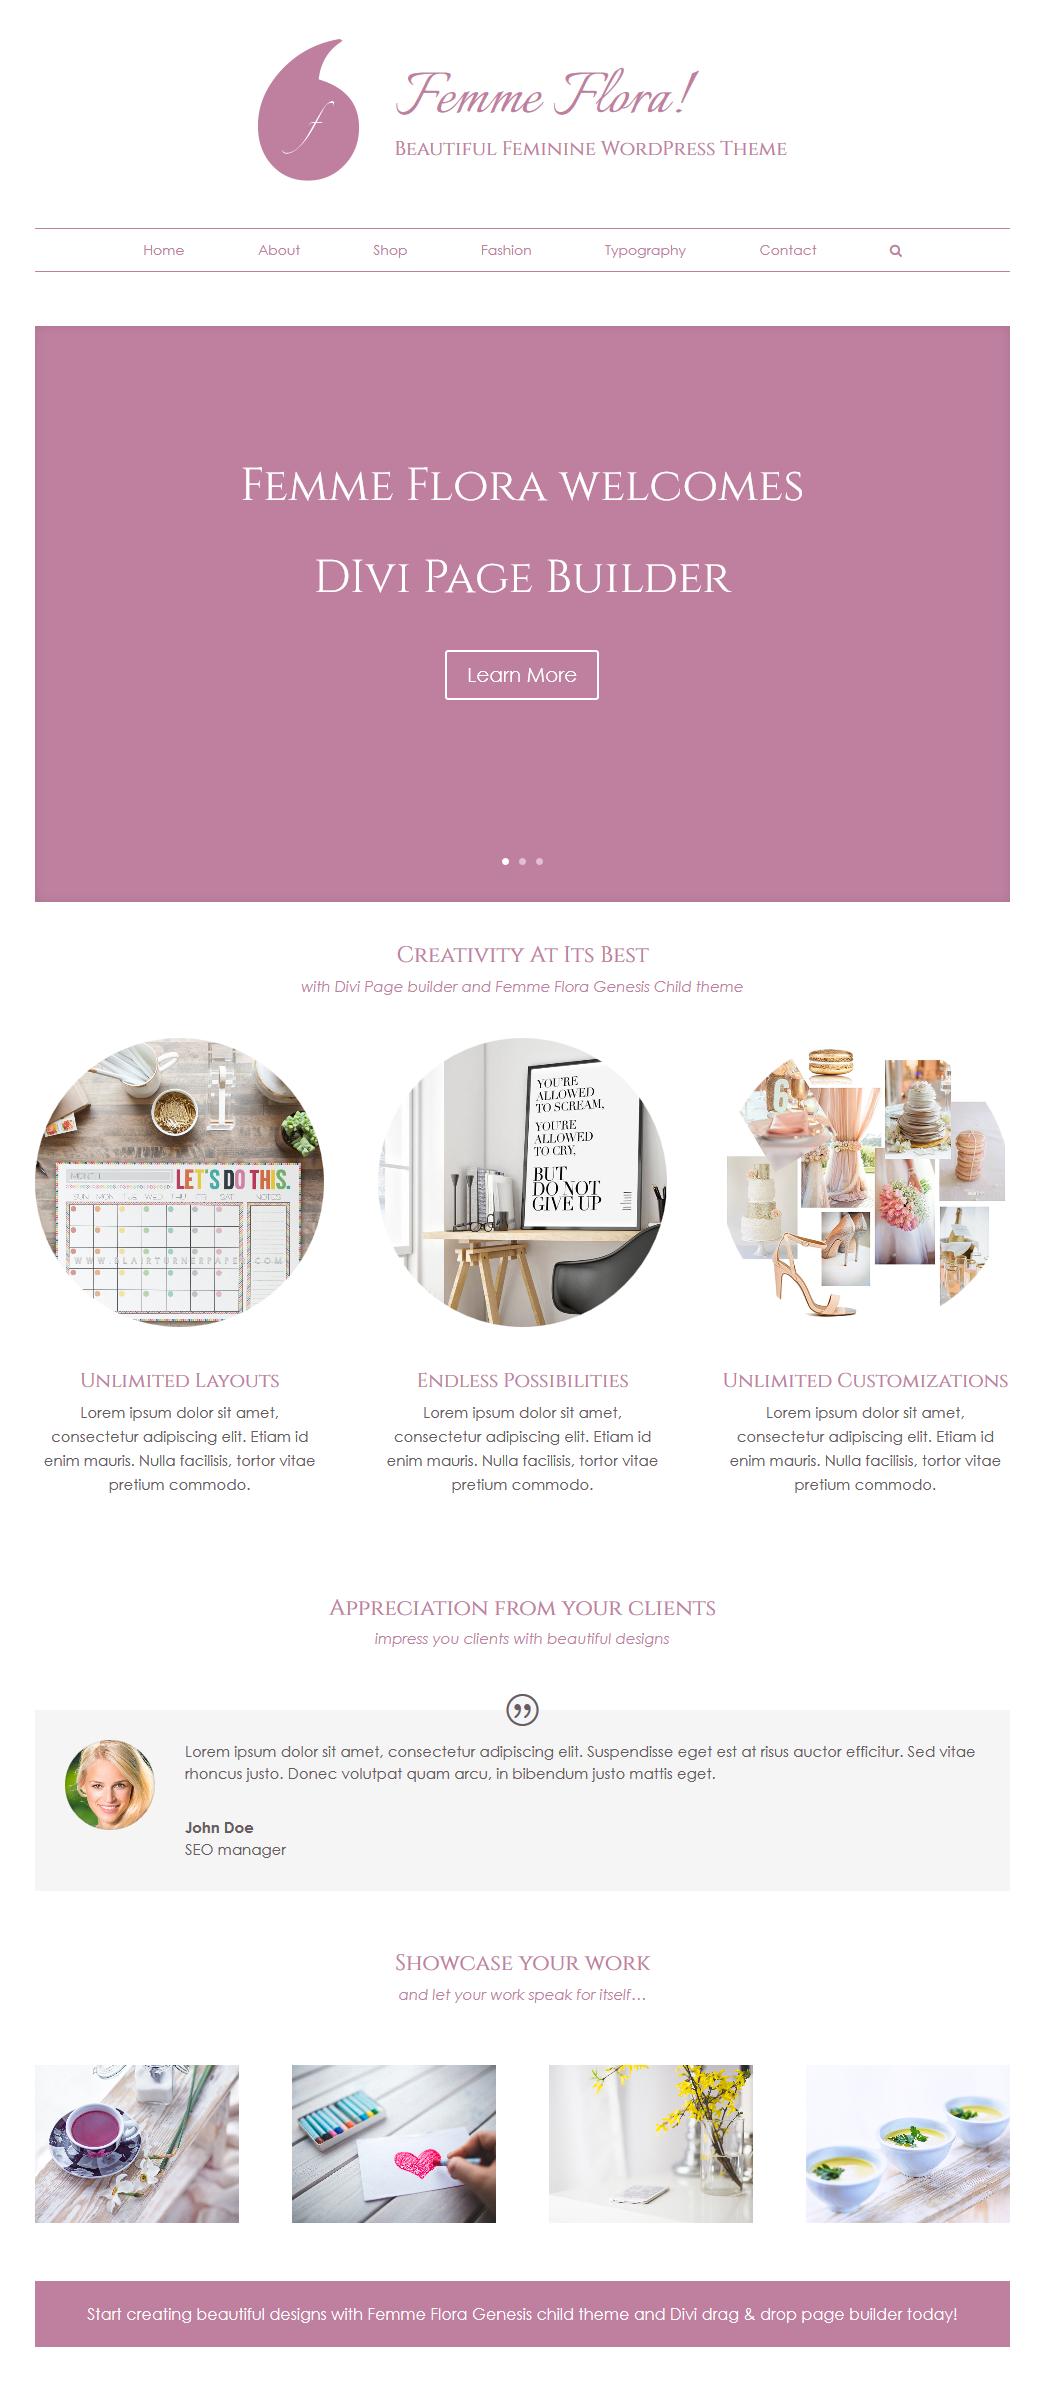 Divi Page Builder With Femme Flora Genesis Child Theme